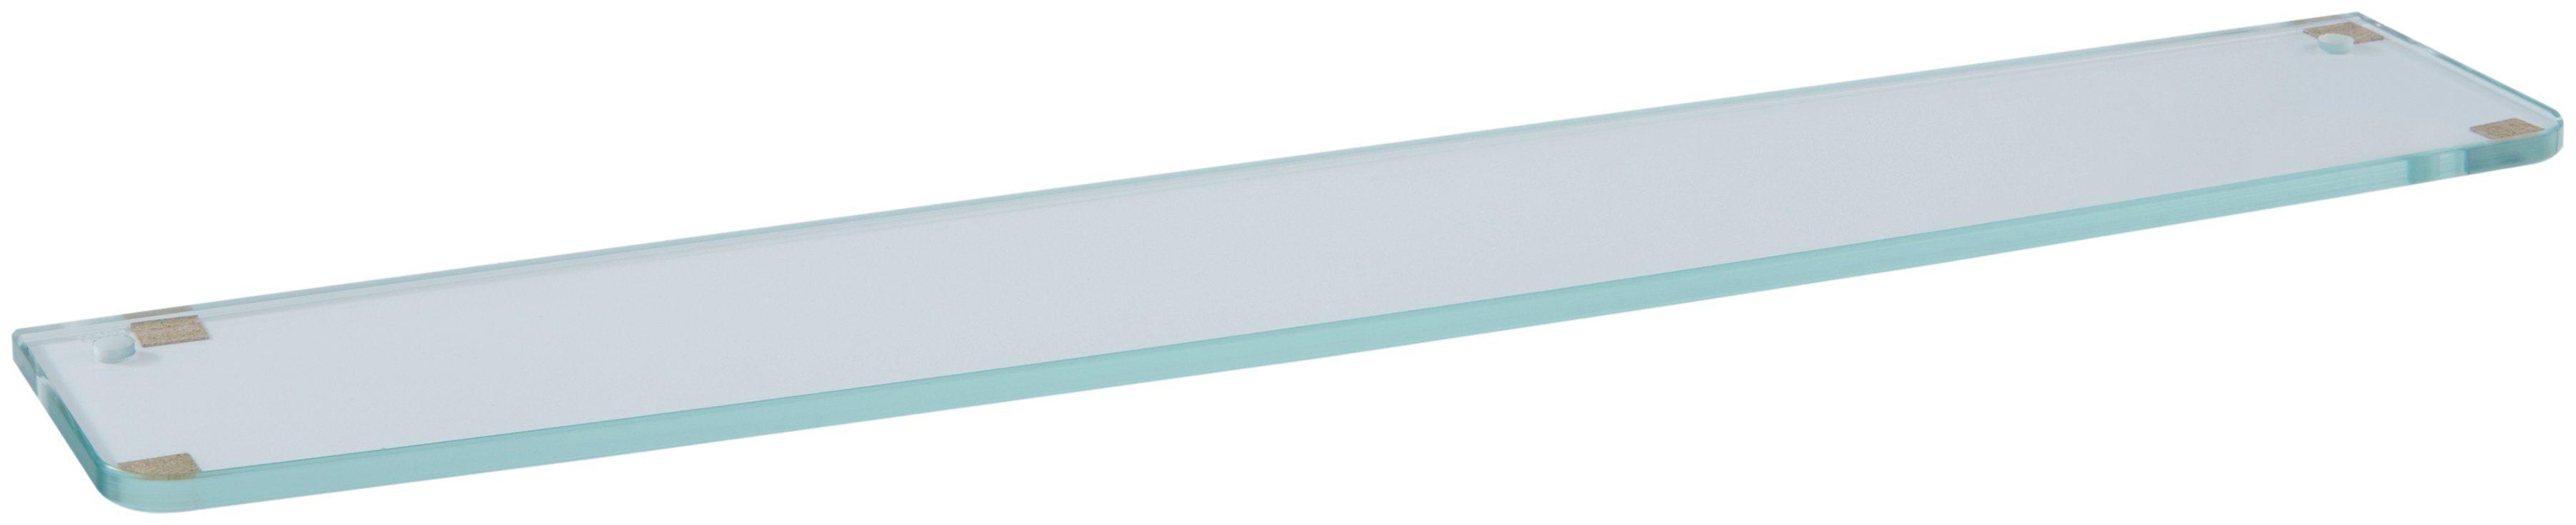 KEUCO Ablageplatte »Elegance«, Kristallglas, 700 x 131 x 10 mm